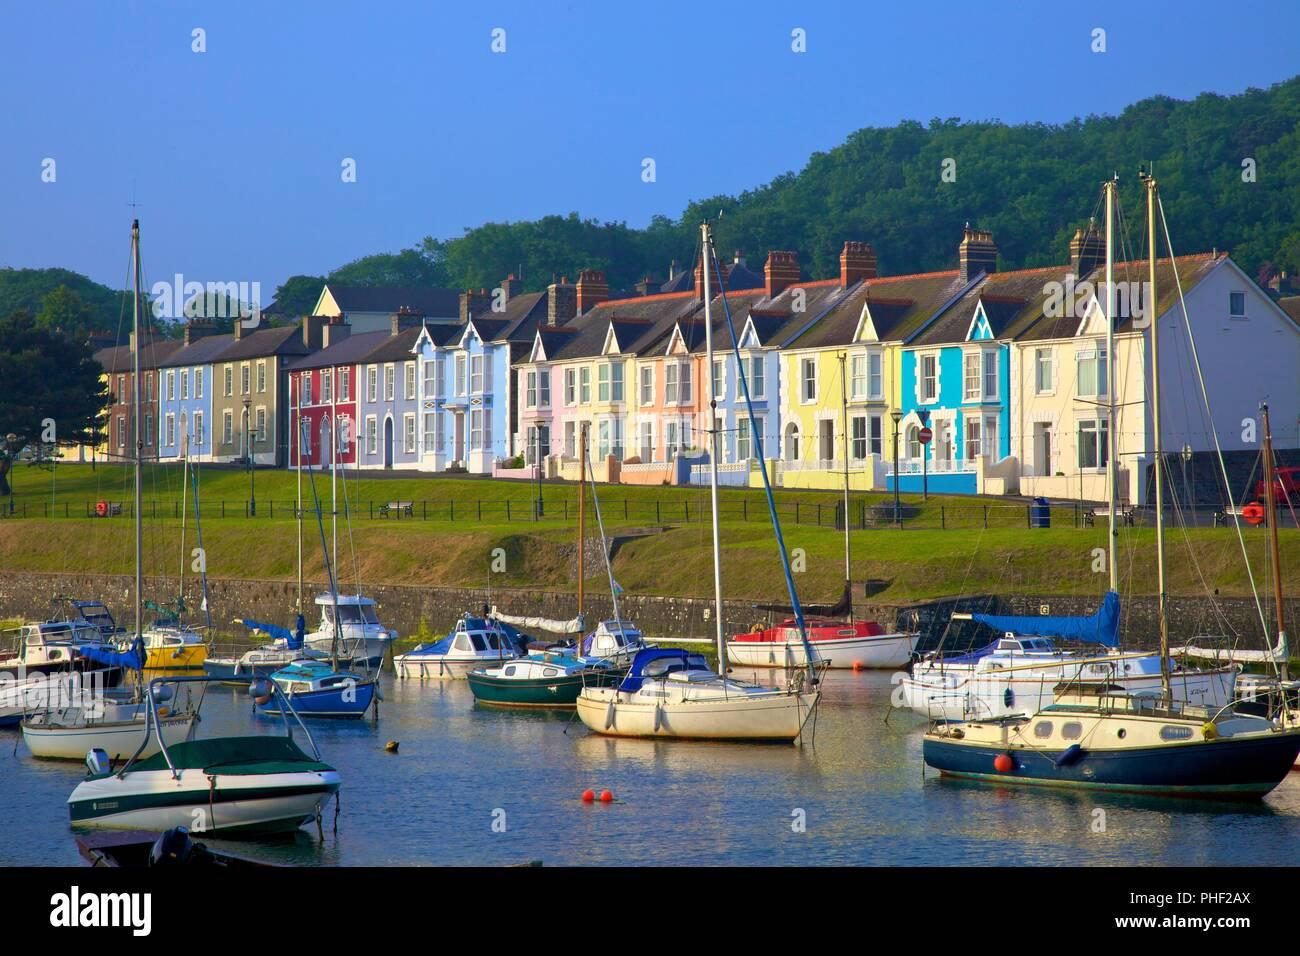 The Harbour at Aberaeron, Cardigan Bay, Wales, United Kingdom, Europe, - Stock Image